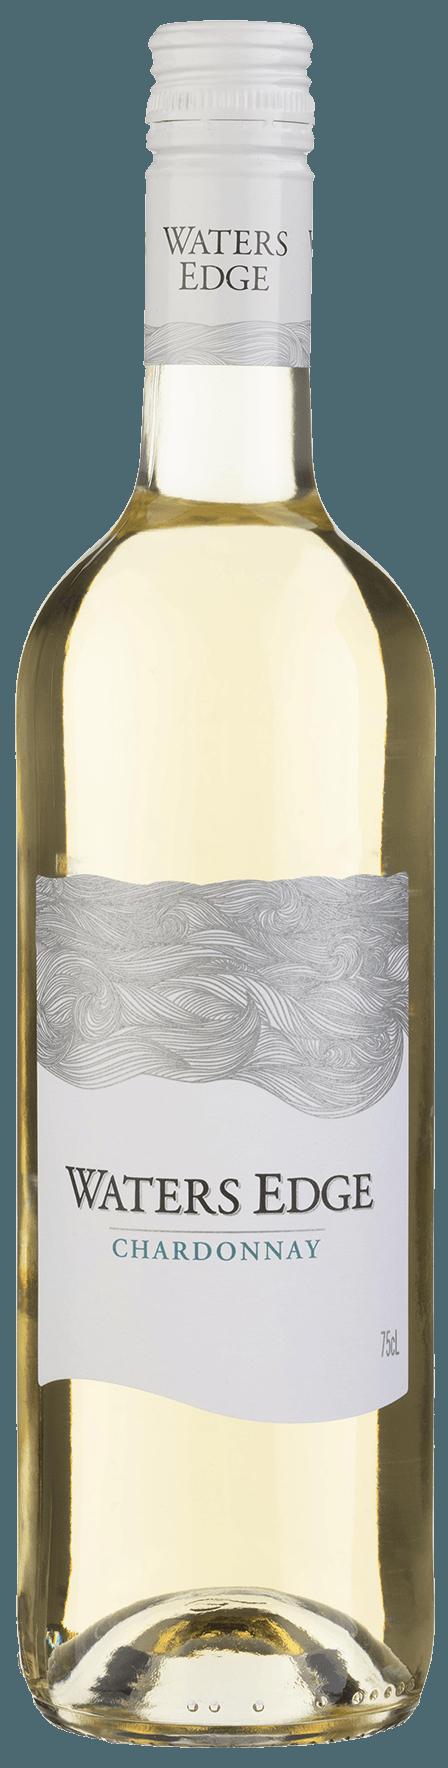 Image 0: Waters Edge Chardonnay